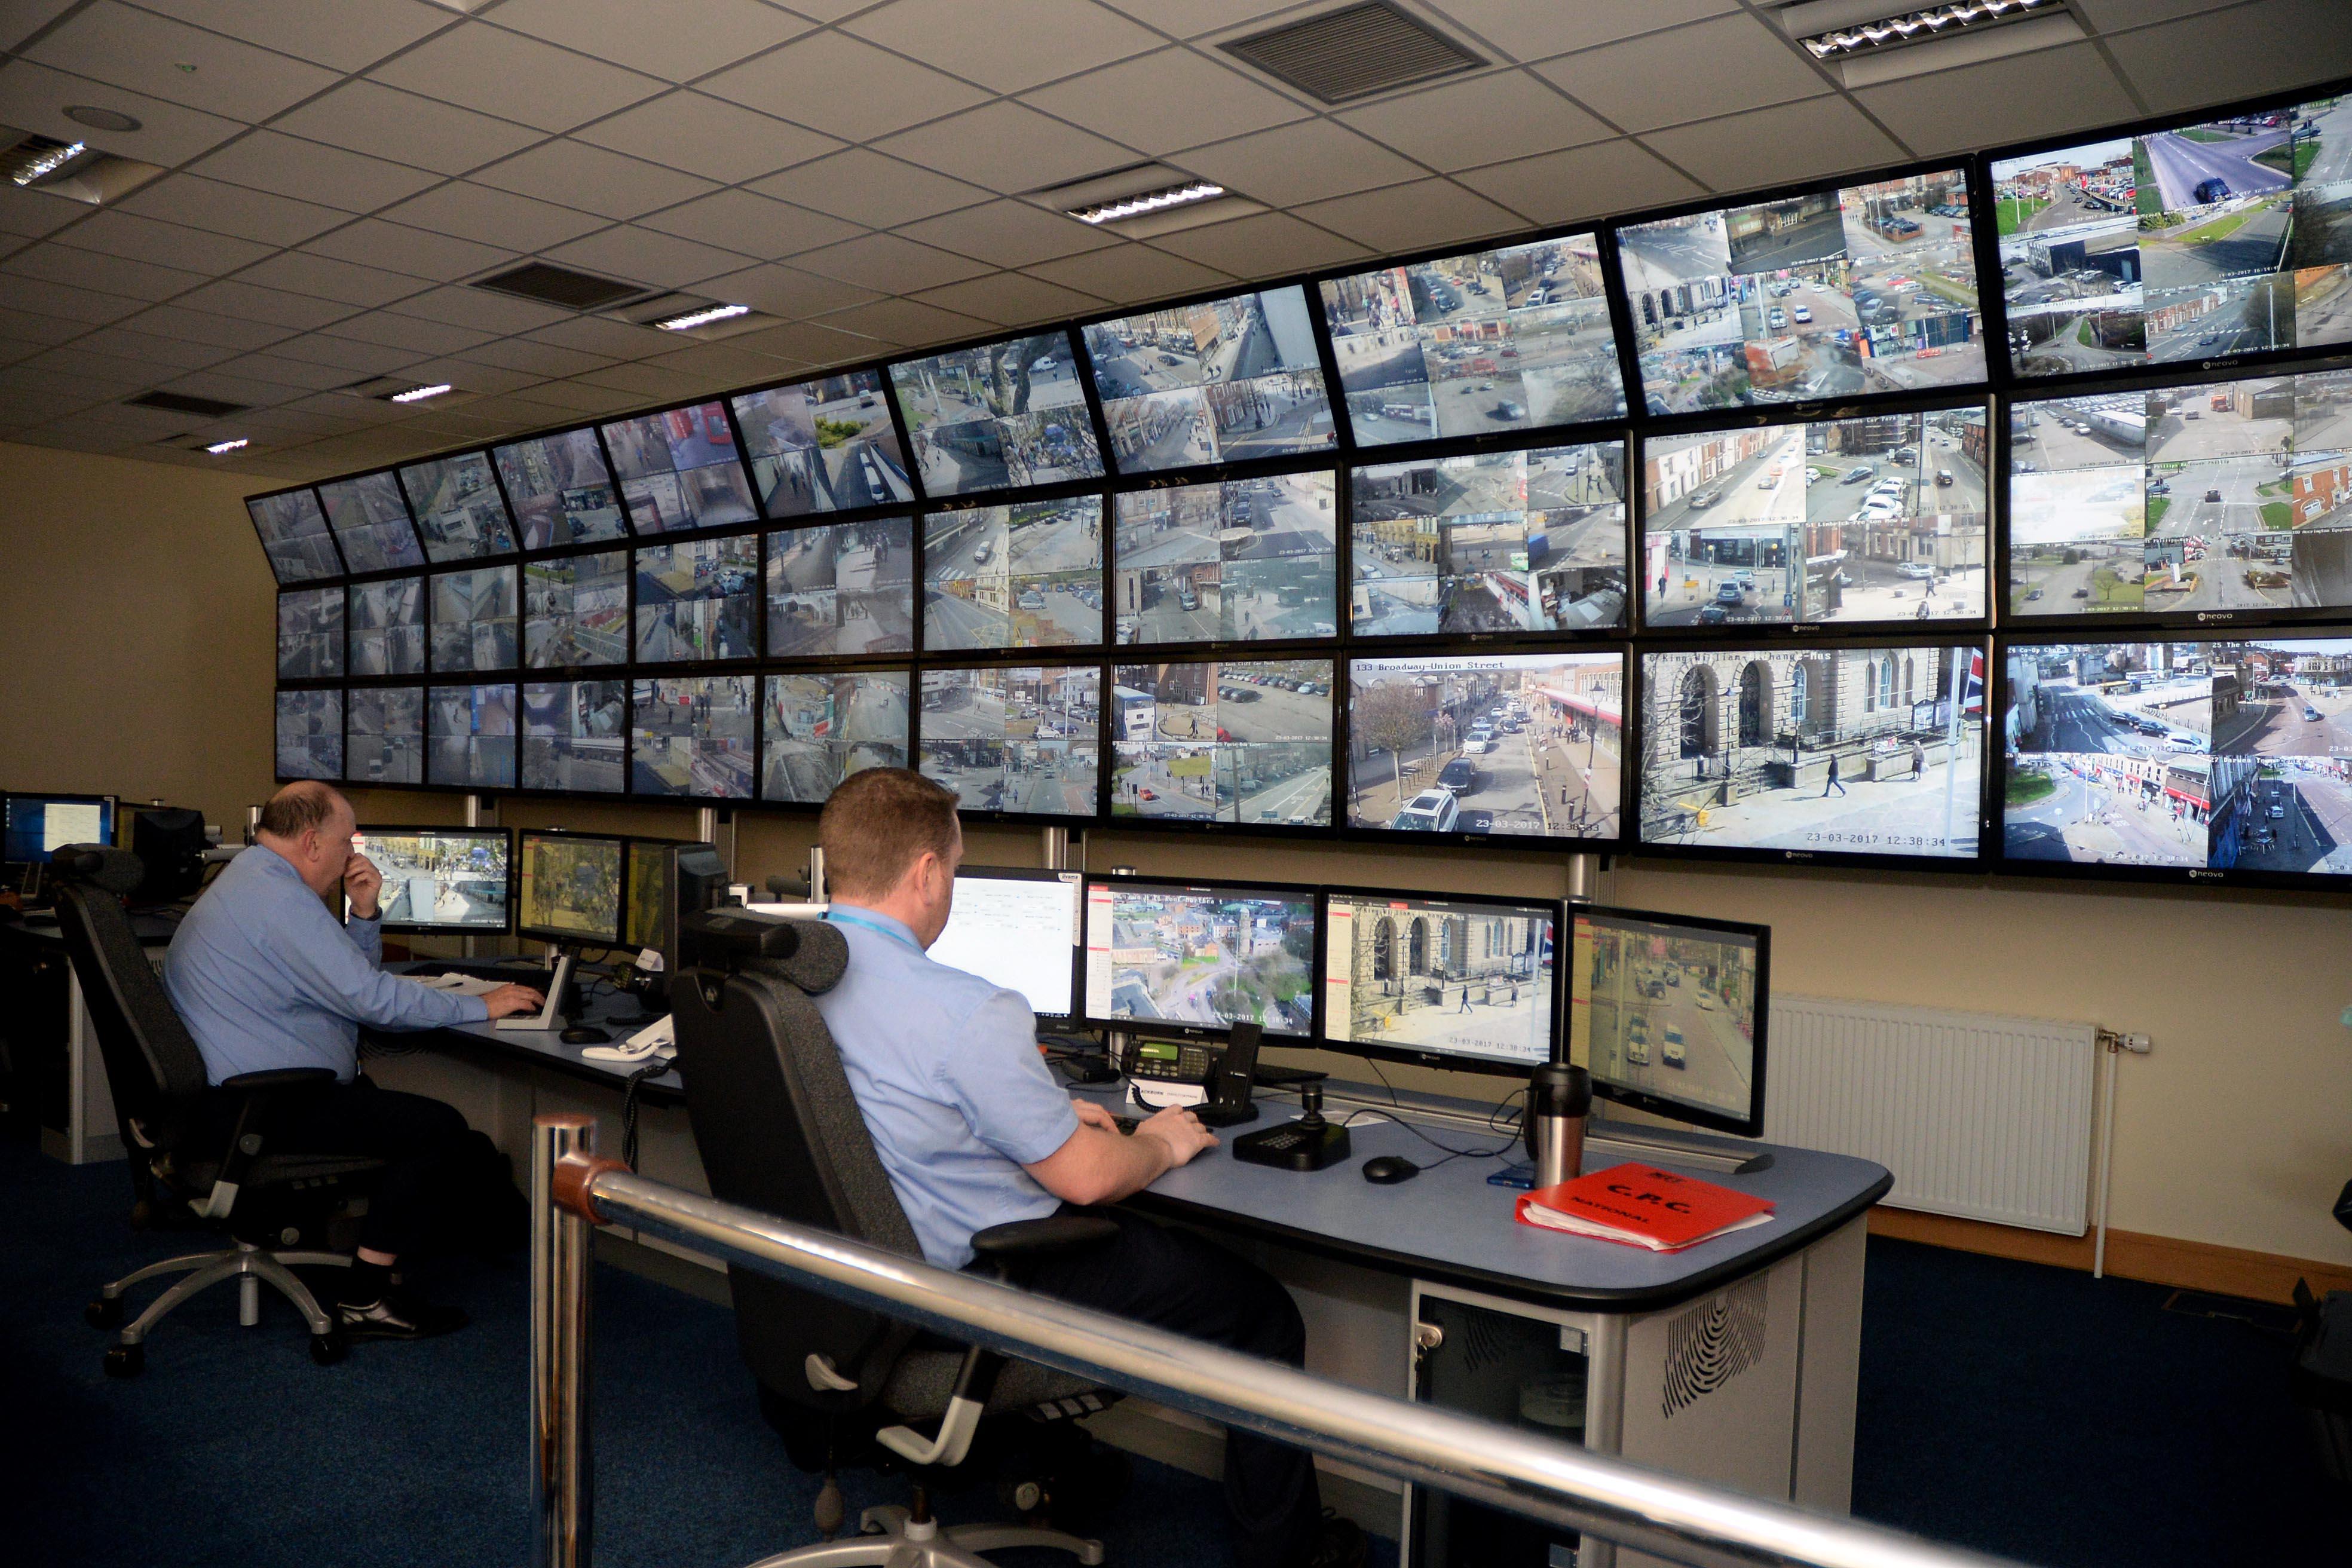 how to set up news camera room software